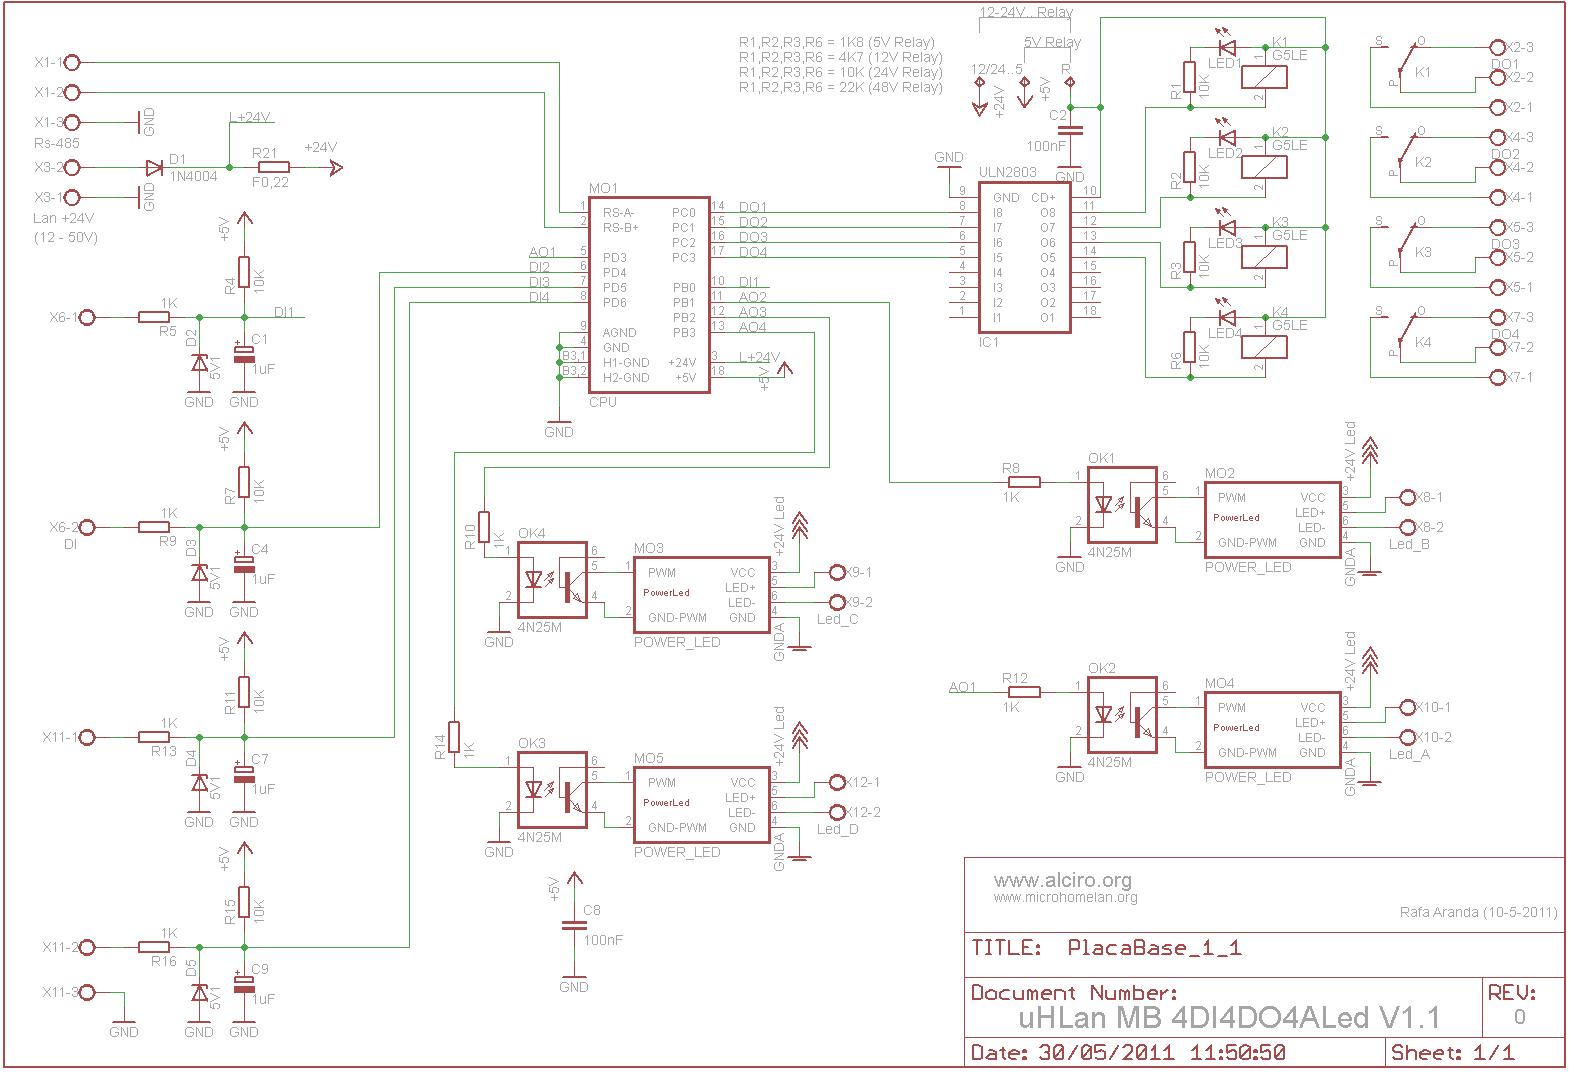 Sch motherboard diagram domtica sencilla fcil y econmica motherboard diagram 4di4do4aled uhlan mb v11 plant automation pooptronica Choice Image